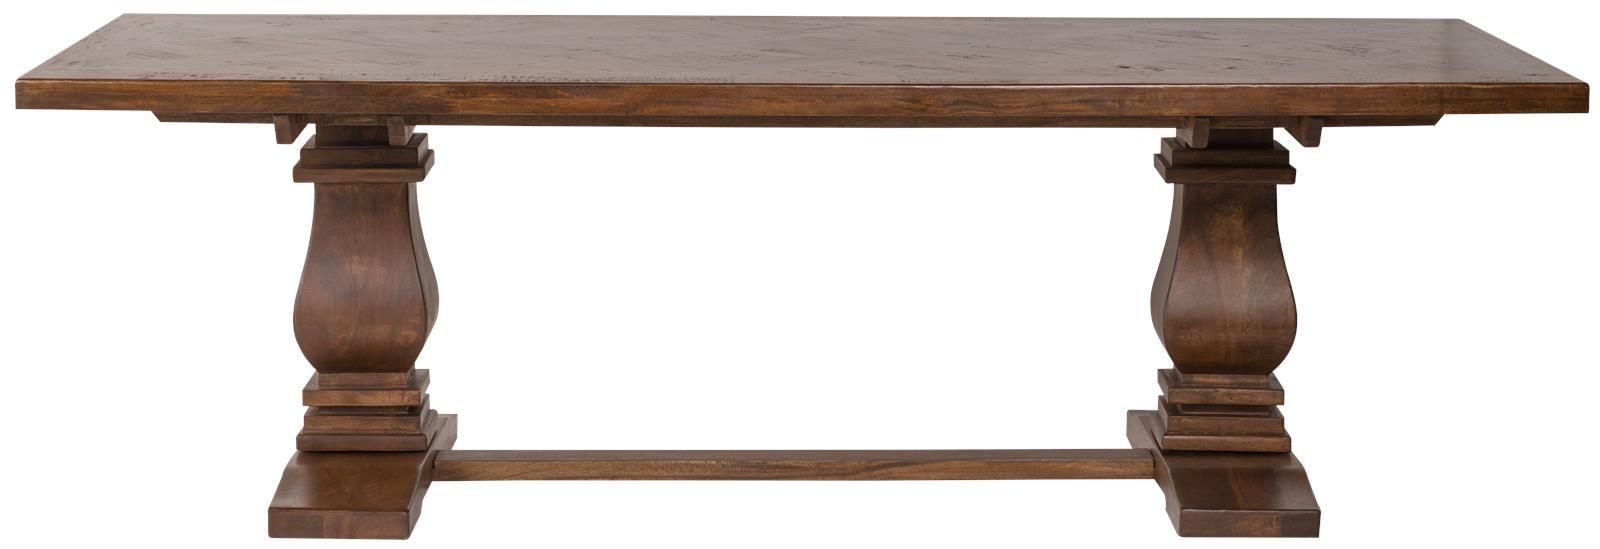 dining table napa chunky wood pillars inlaid top rectangle aged rh pinterest co uk